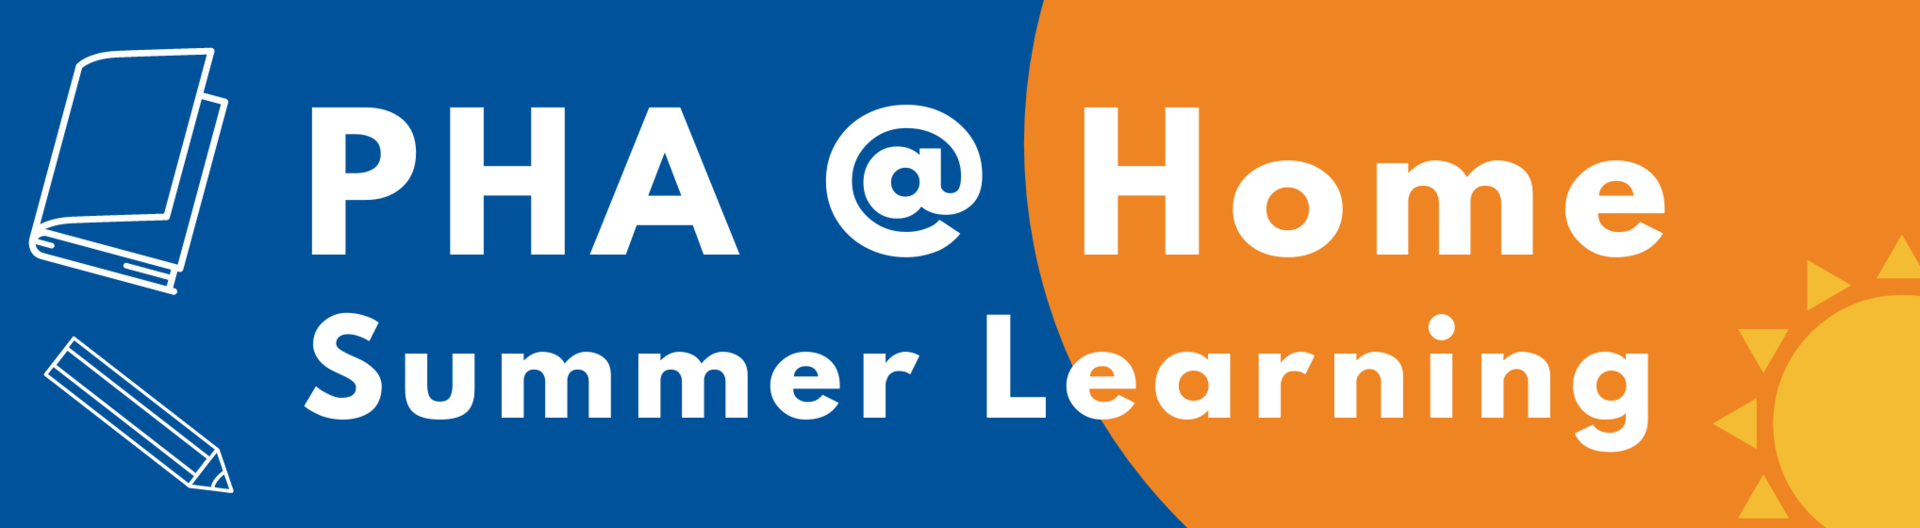 PHA @ Home Summer Learning